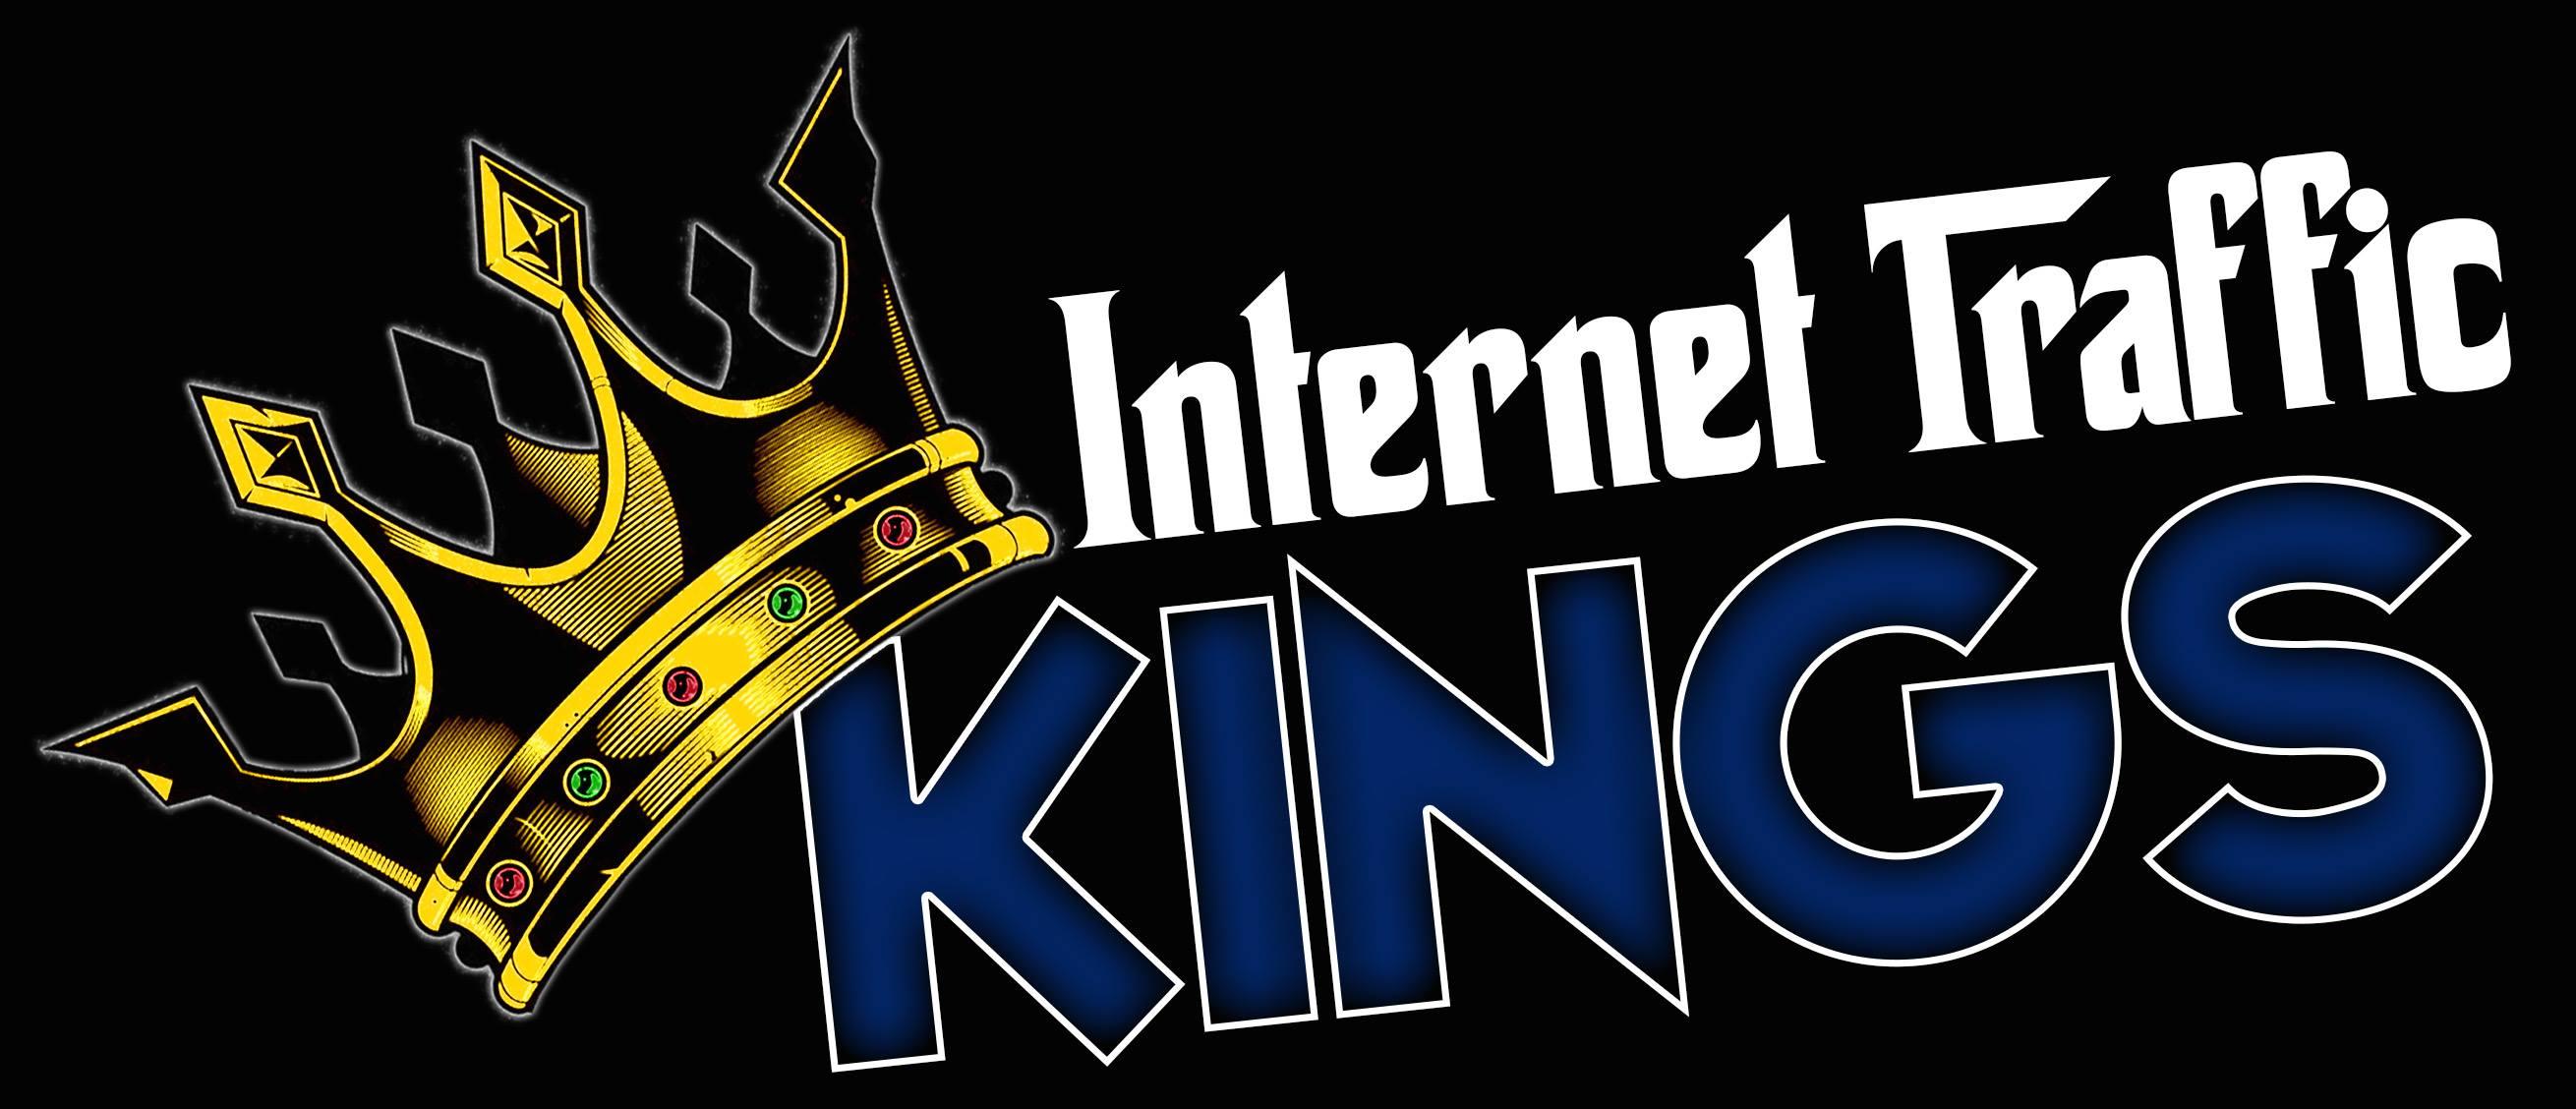 ILC's Bennet Kelley featured on Internet Traffic Kings